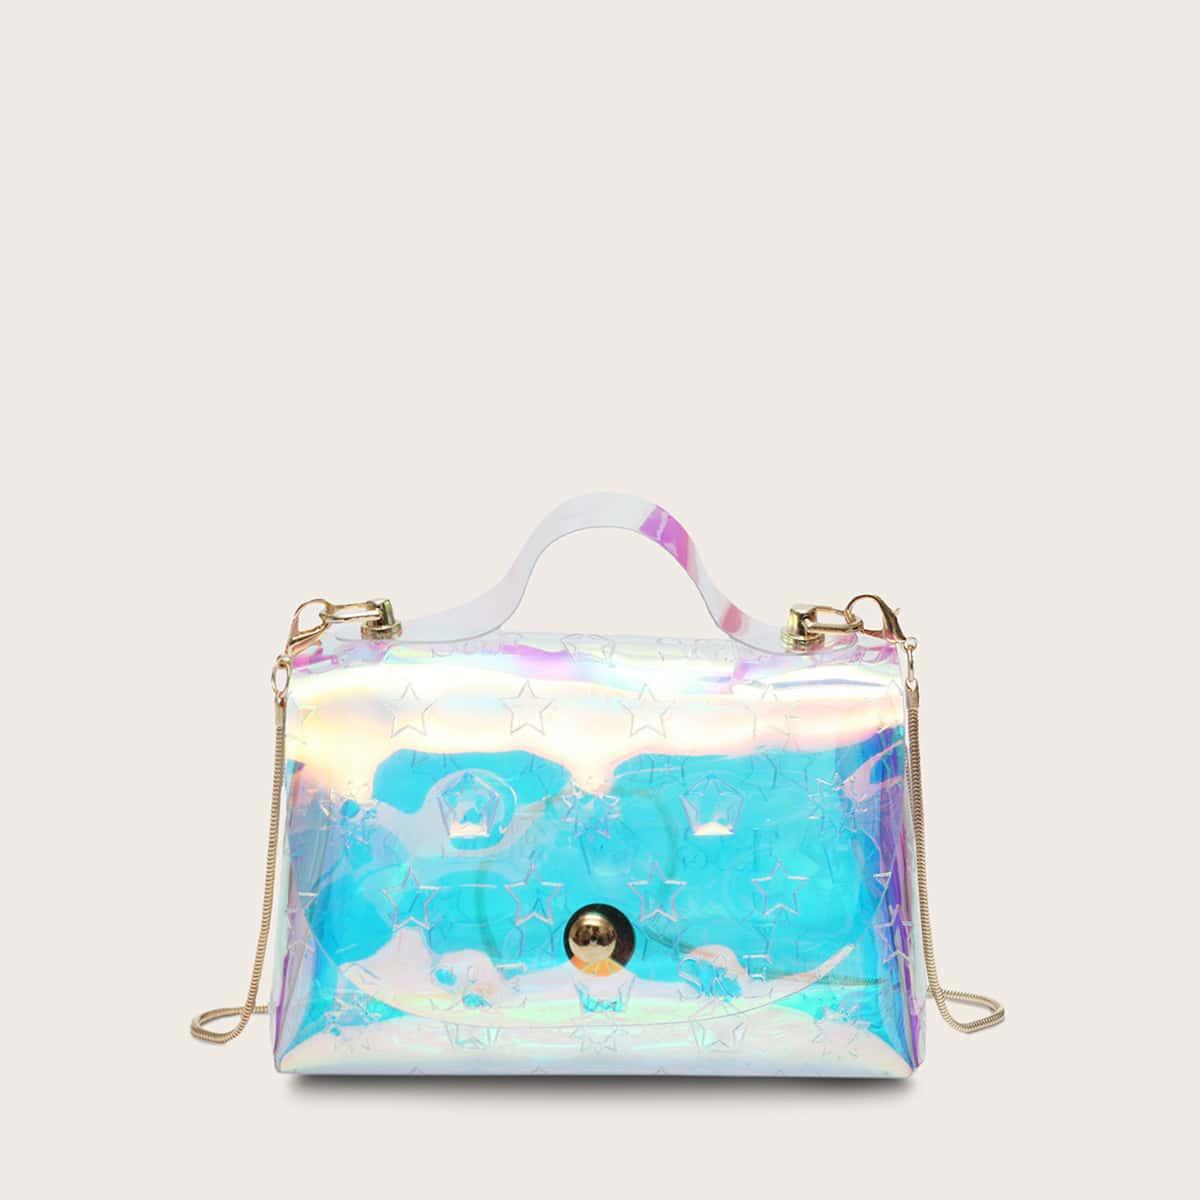 Satchel-tas voor meisjes met transparant geo-patroon